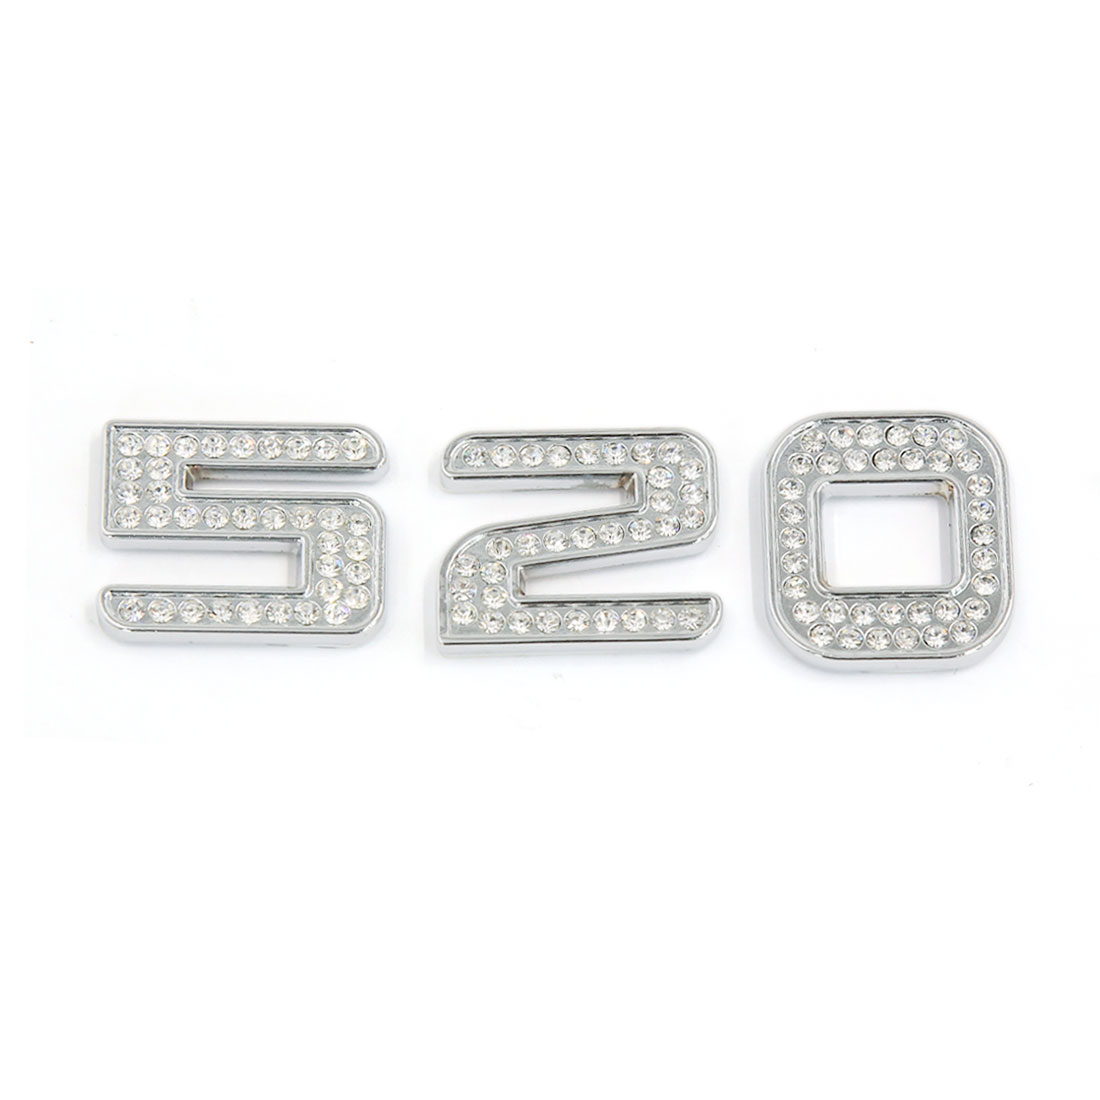 Universal Metal Adhesive 520 Style 3D Car Auto Body Badge Decal Emblem Sticker